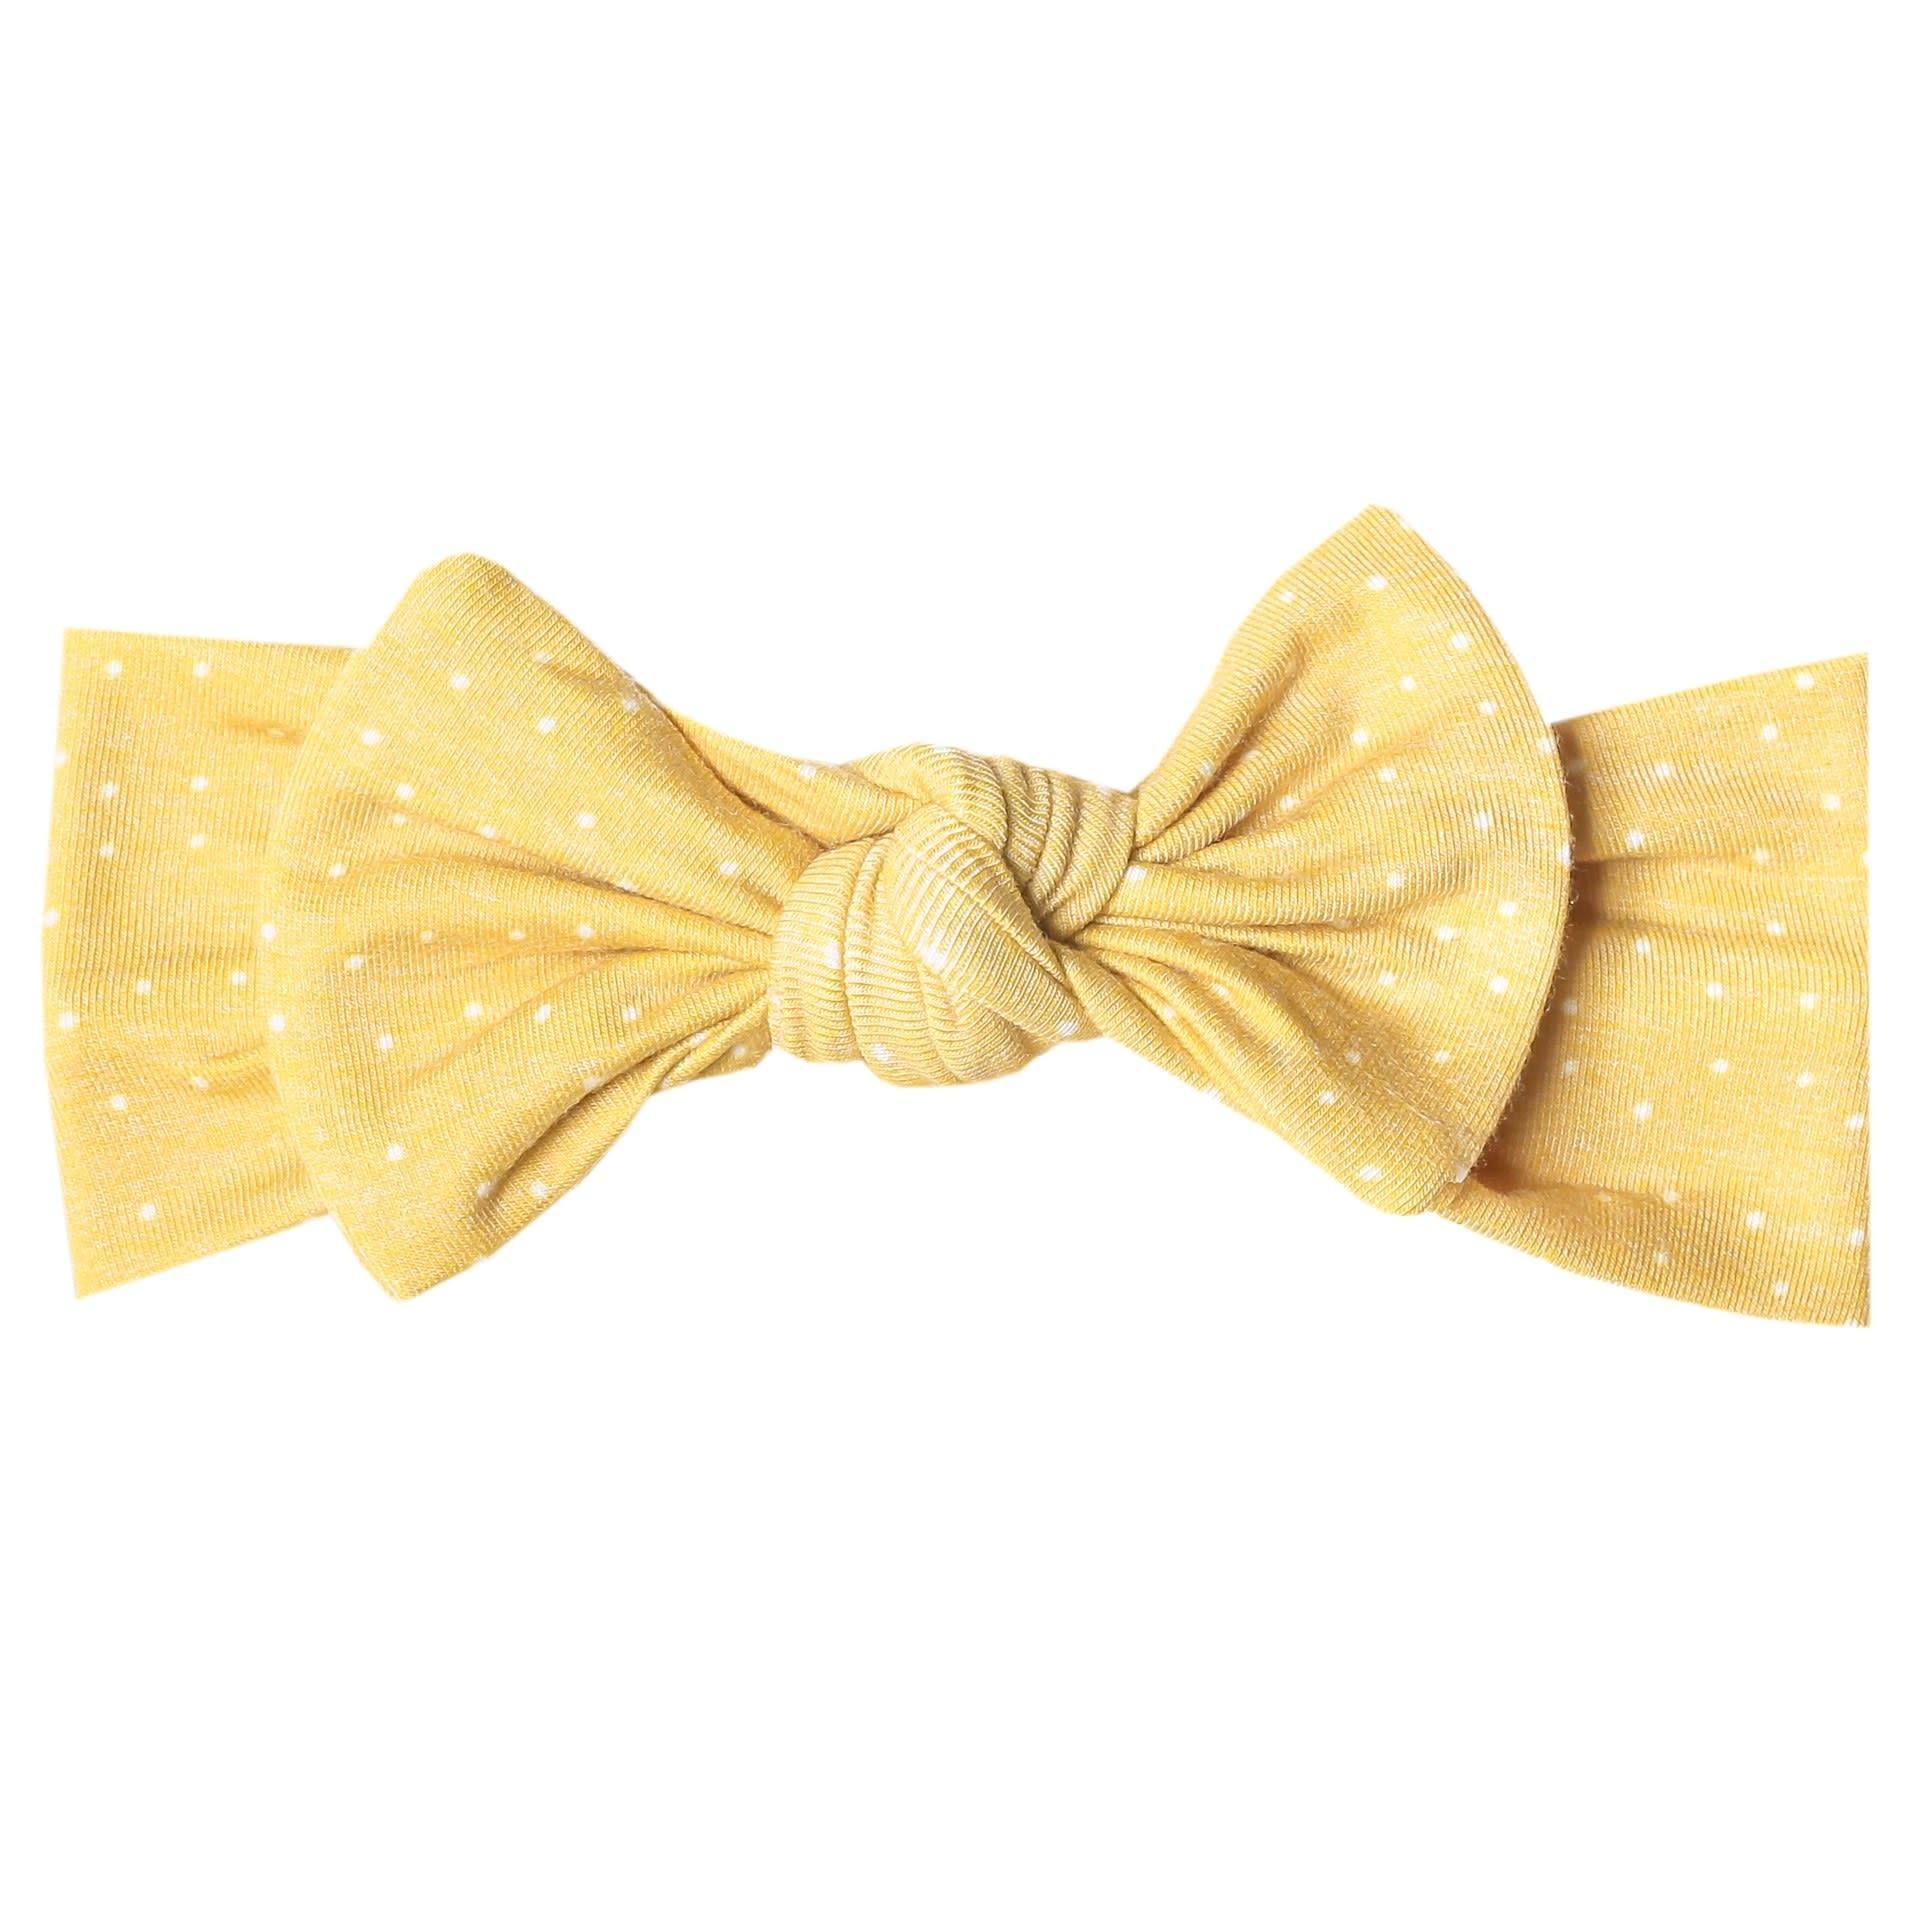 Copper Pearl Knit Headband - Marigold Yellow